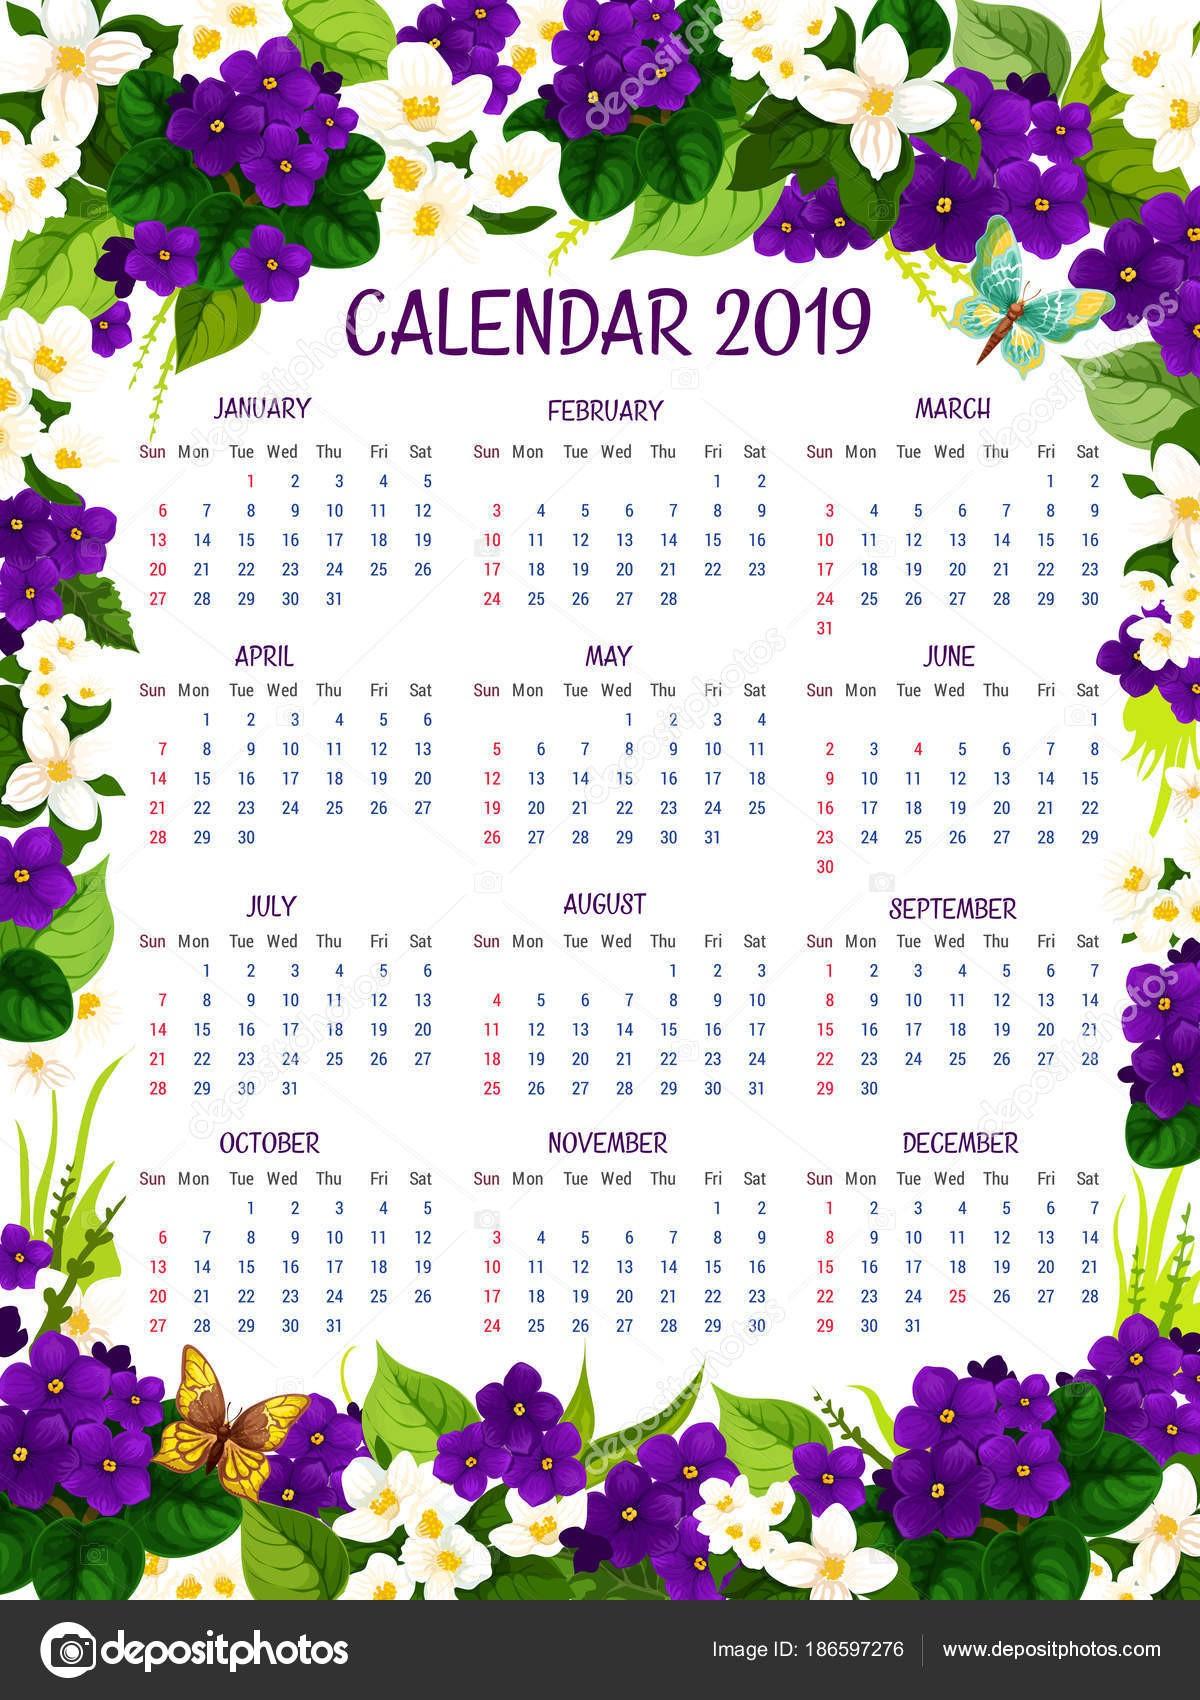 Calendario 2019 Annuale Da Stampare Gratis Mejores Y Más Novedosos Disegno Floreale Fiori Del Croco Di 2019 Calendario Vettoriale